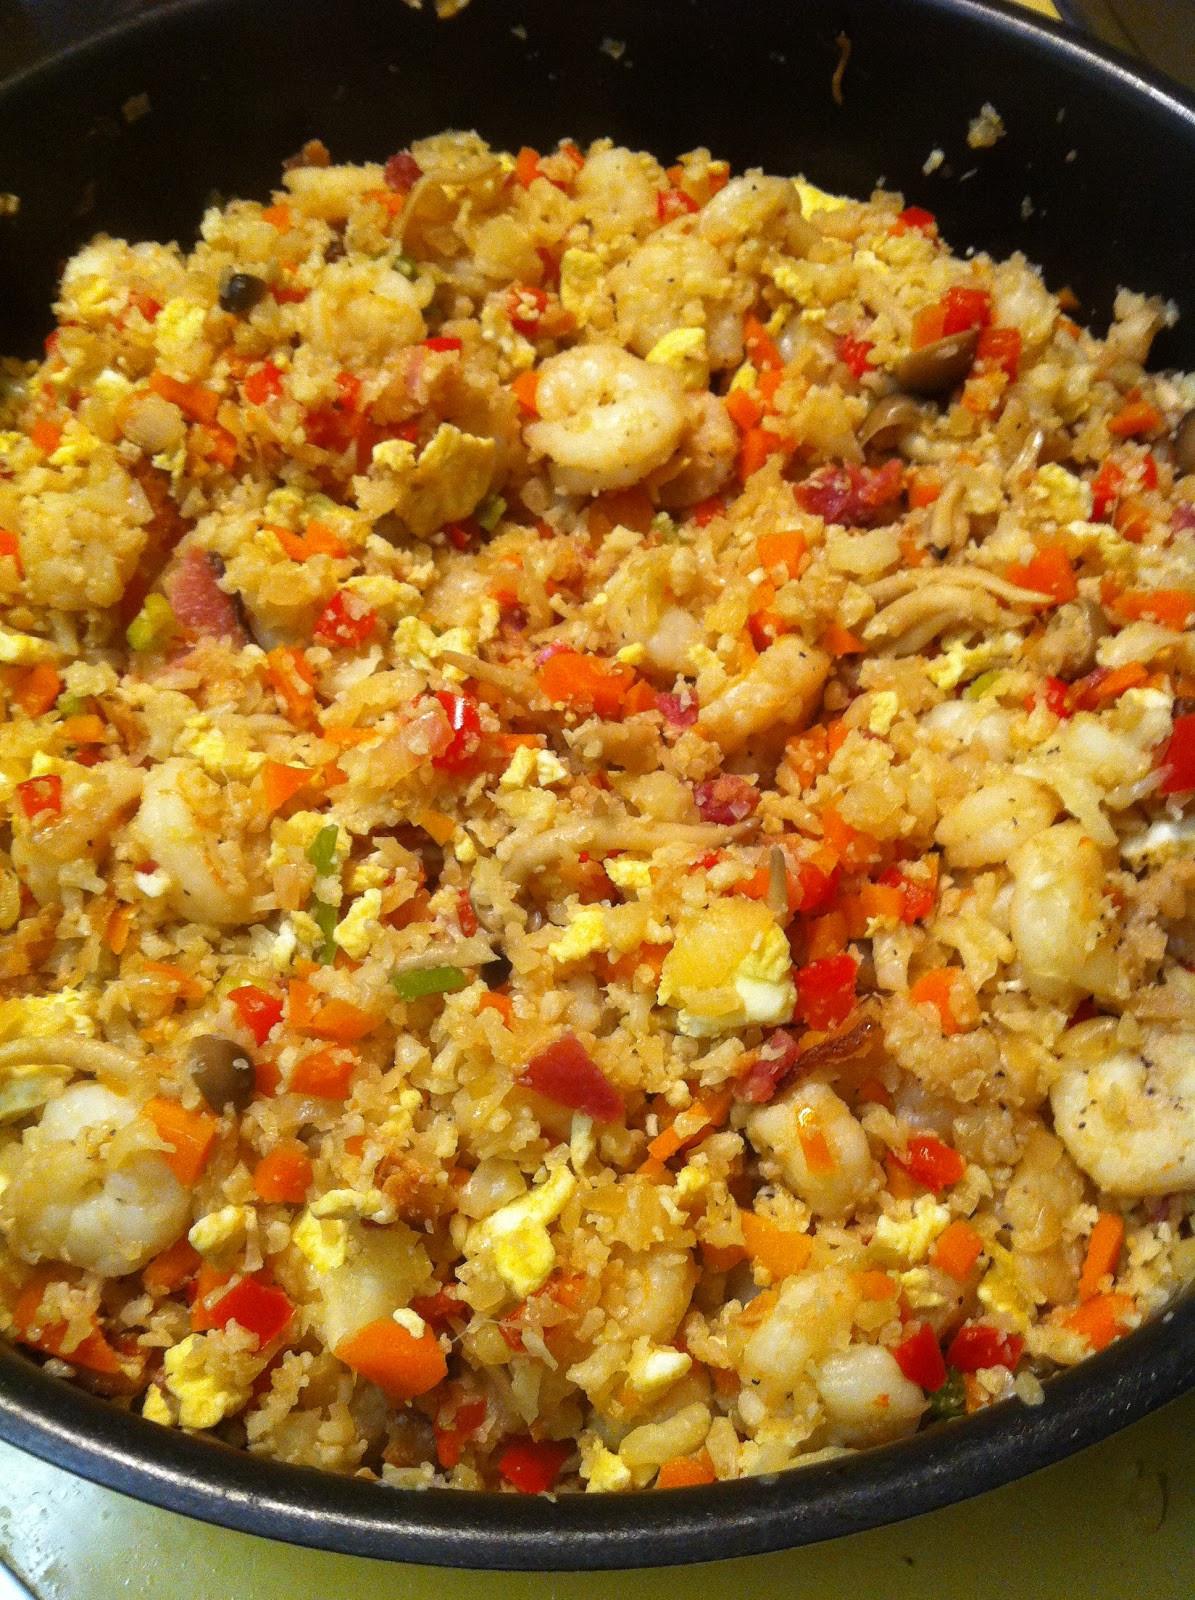 Cauliflower Fried Rice  The Accidental Chef Cauliflower Fried Rice